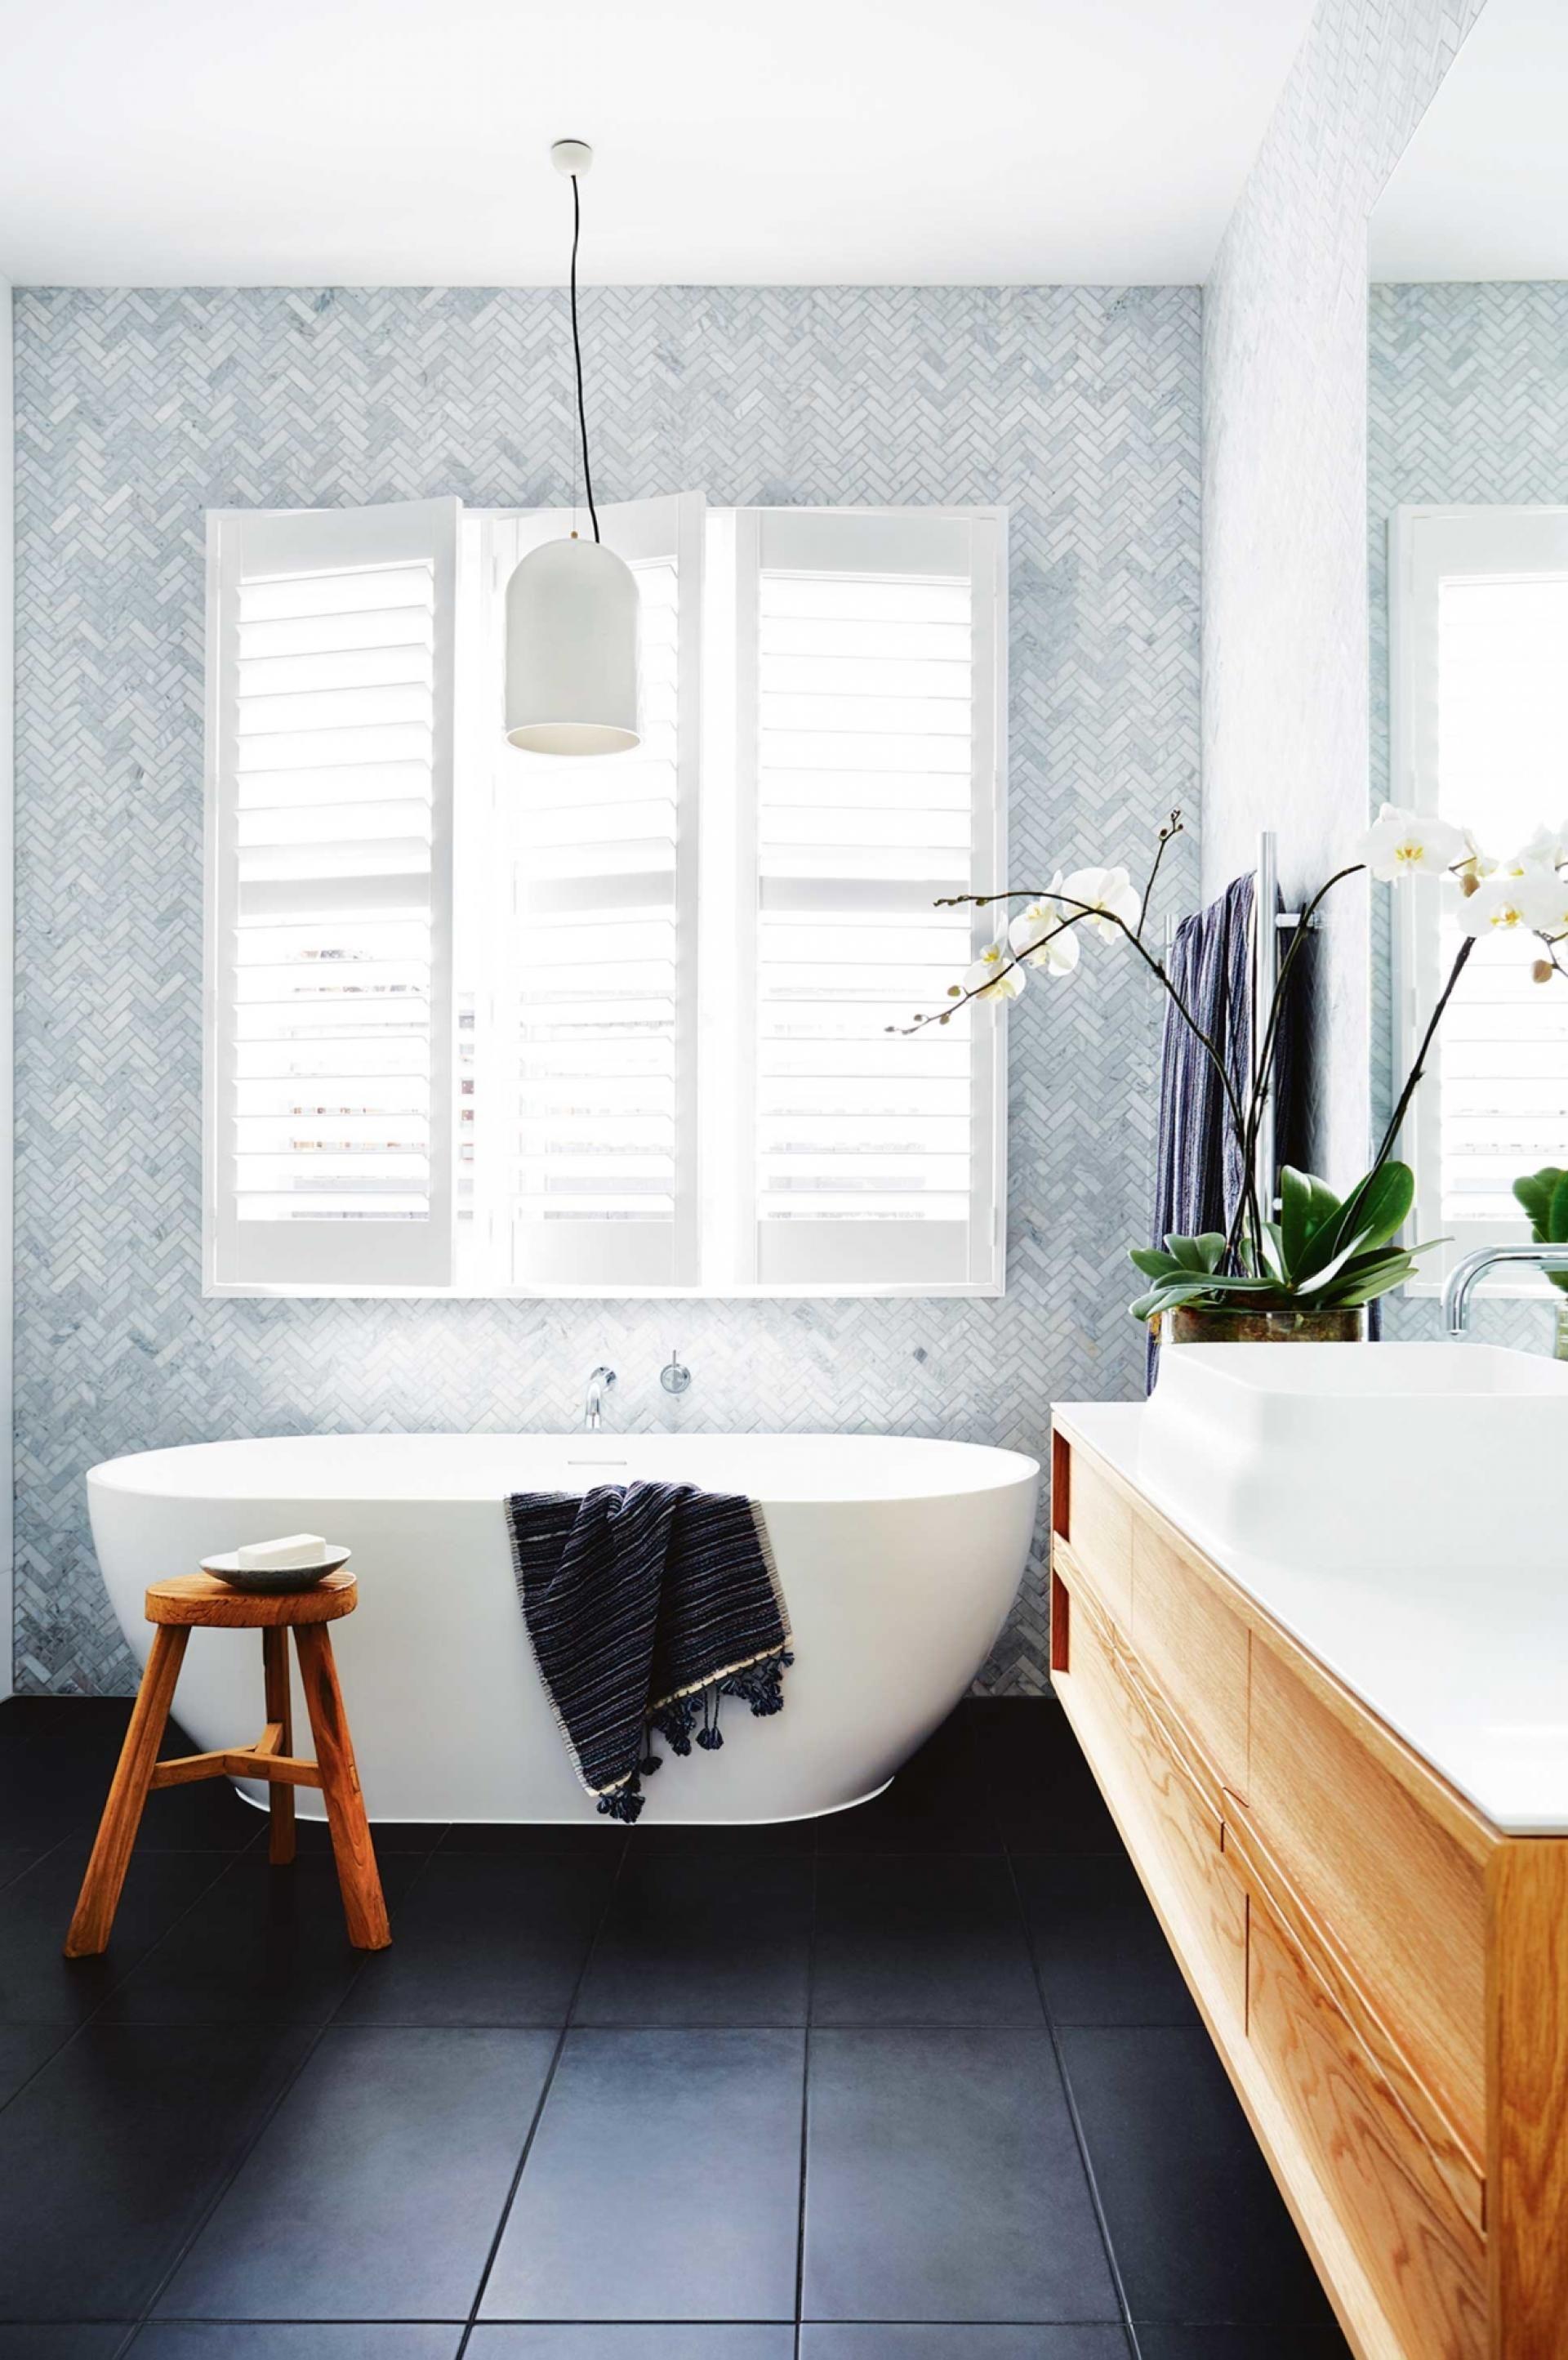 Главная in 2018 | Master bath | Pinterest | Timber vanity, Wall ...